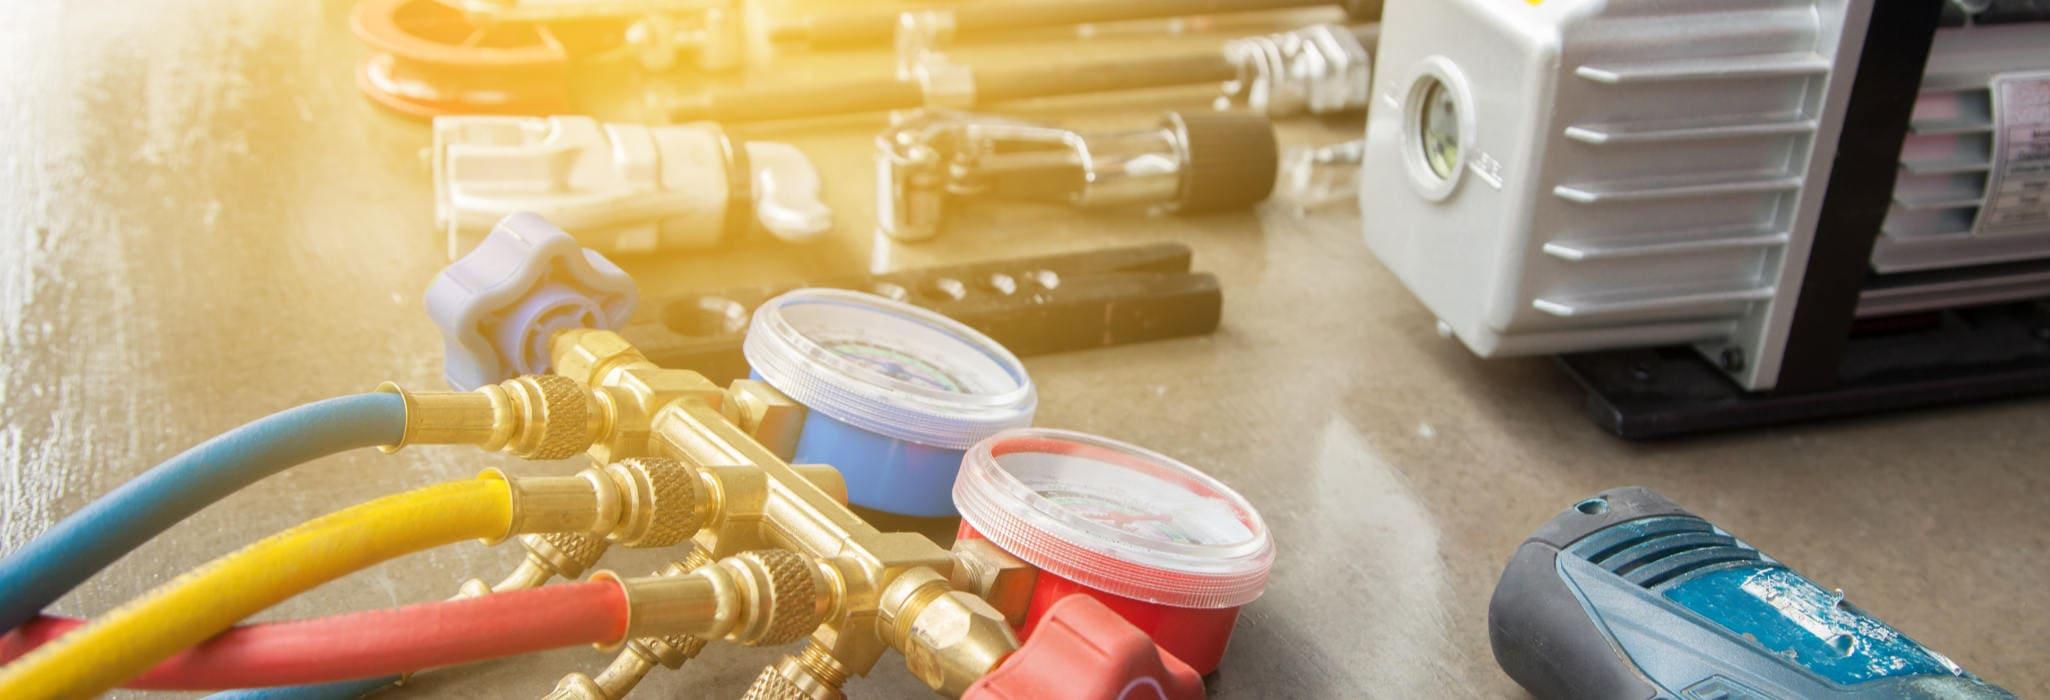 Maintenance Membership Program   manometers measuring equipment for filling air conditioners,gauges.